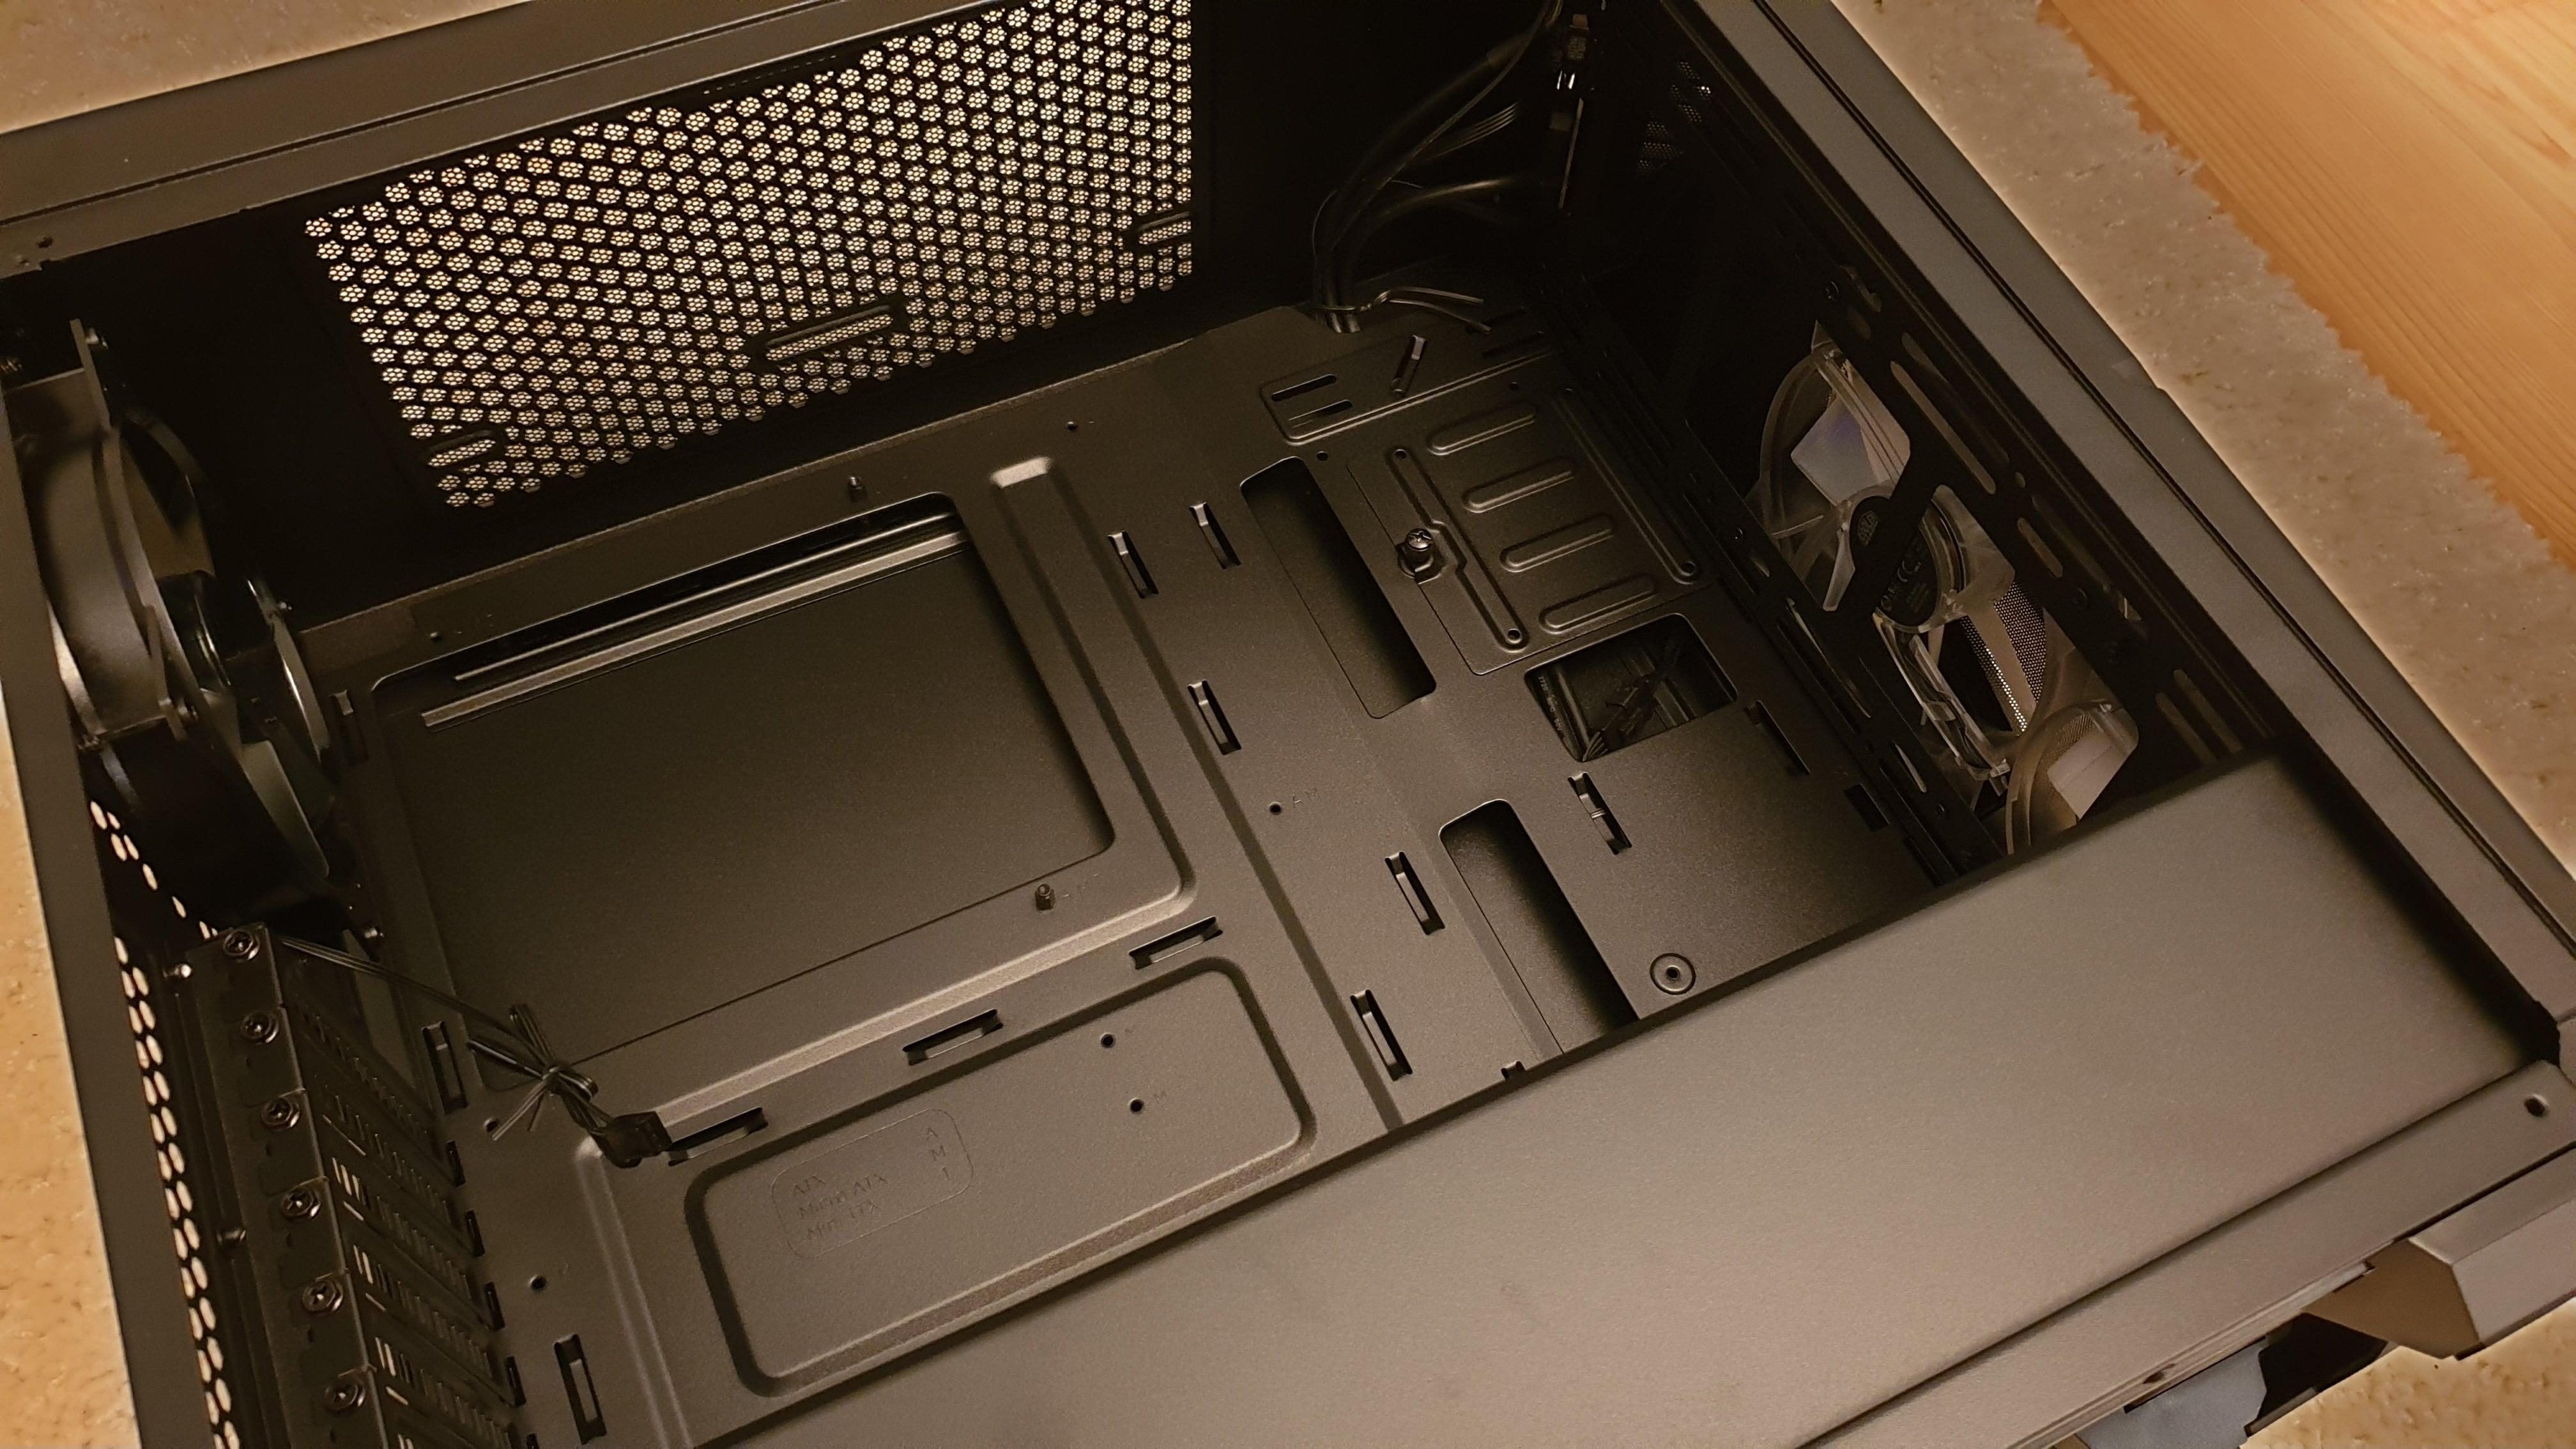 Test obudowy Cooler Master MasterBox K500 Phantom Gaming Edition - tak długa nazwa musi zwiastować cuda? 23